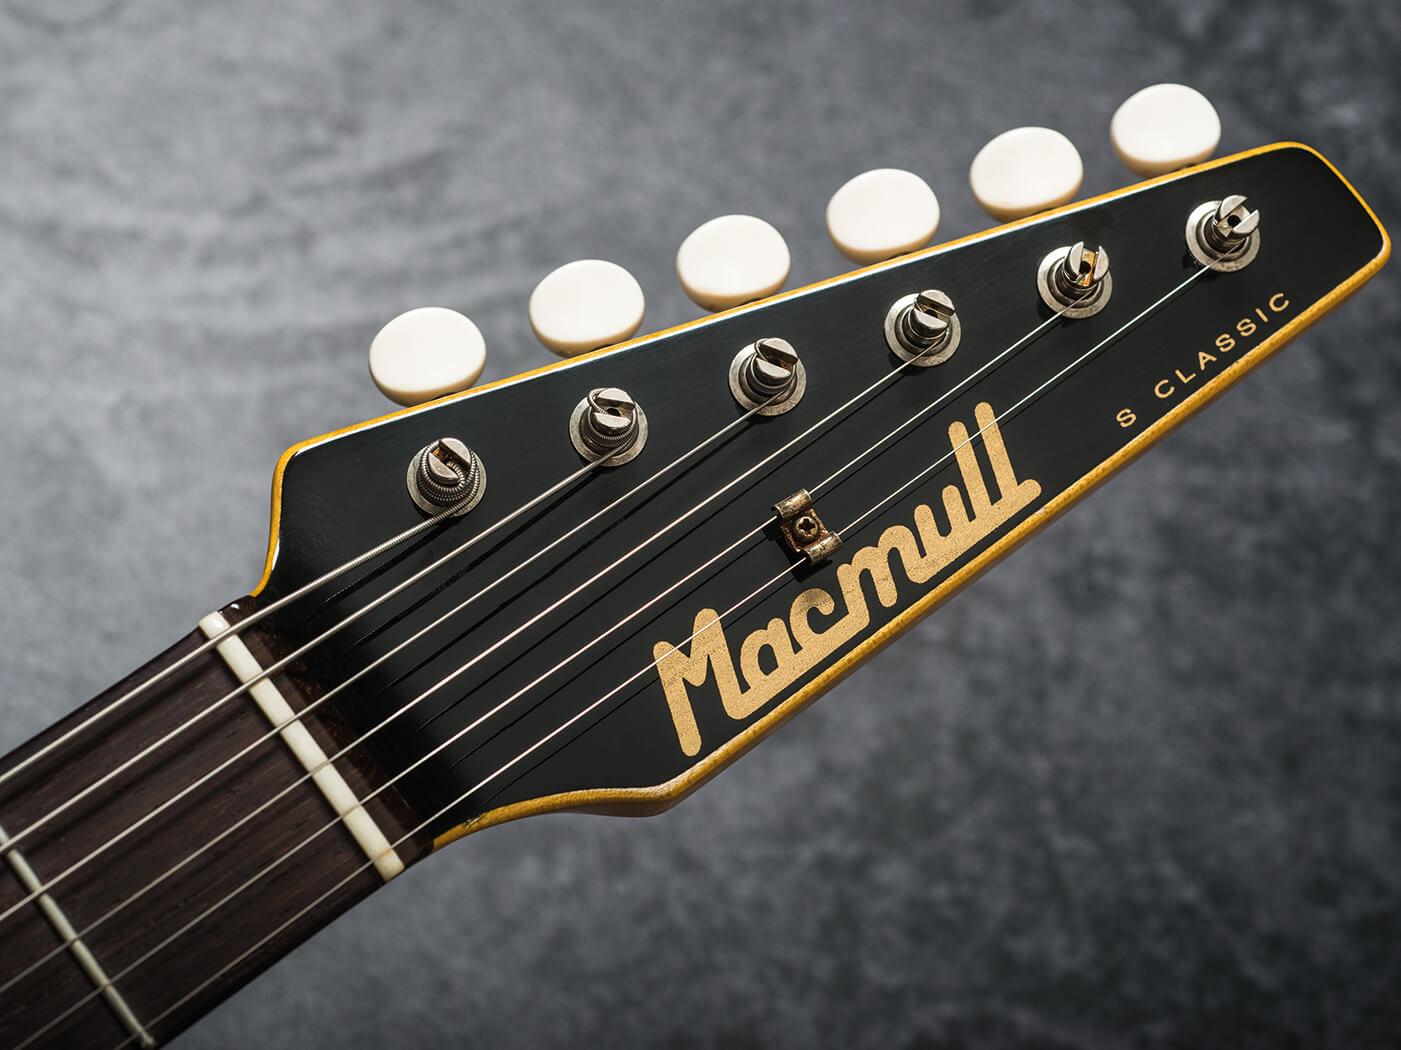 Macmull Diamond Superlight S-Classic headstock